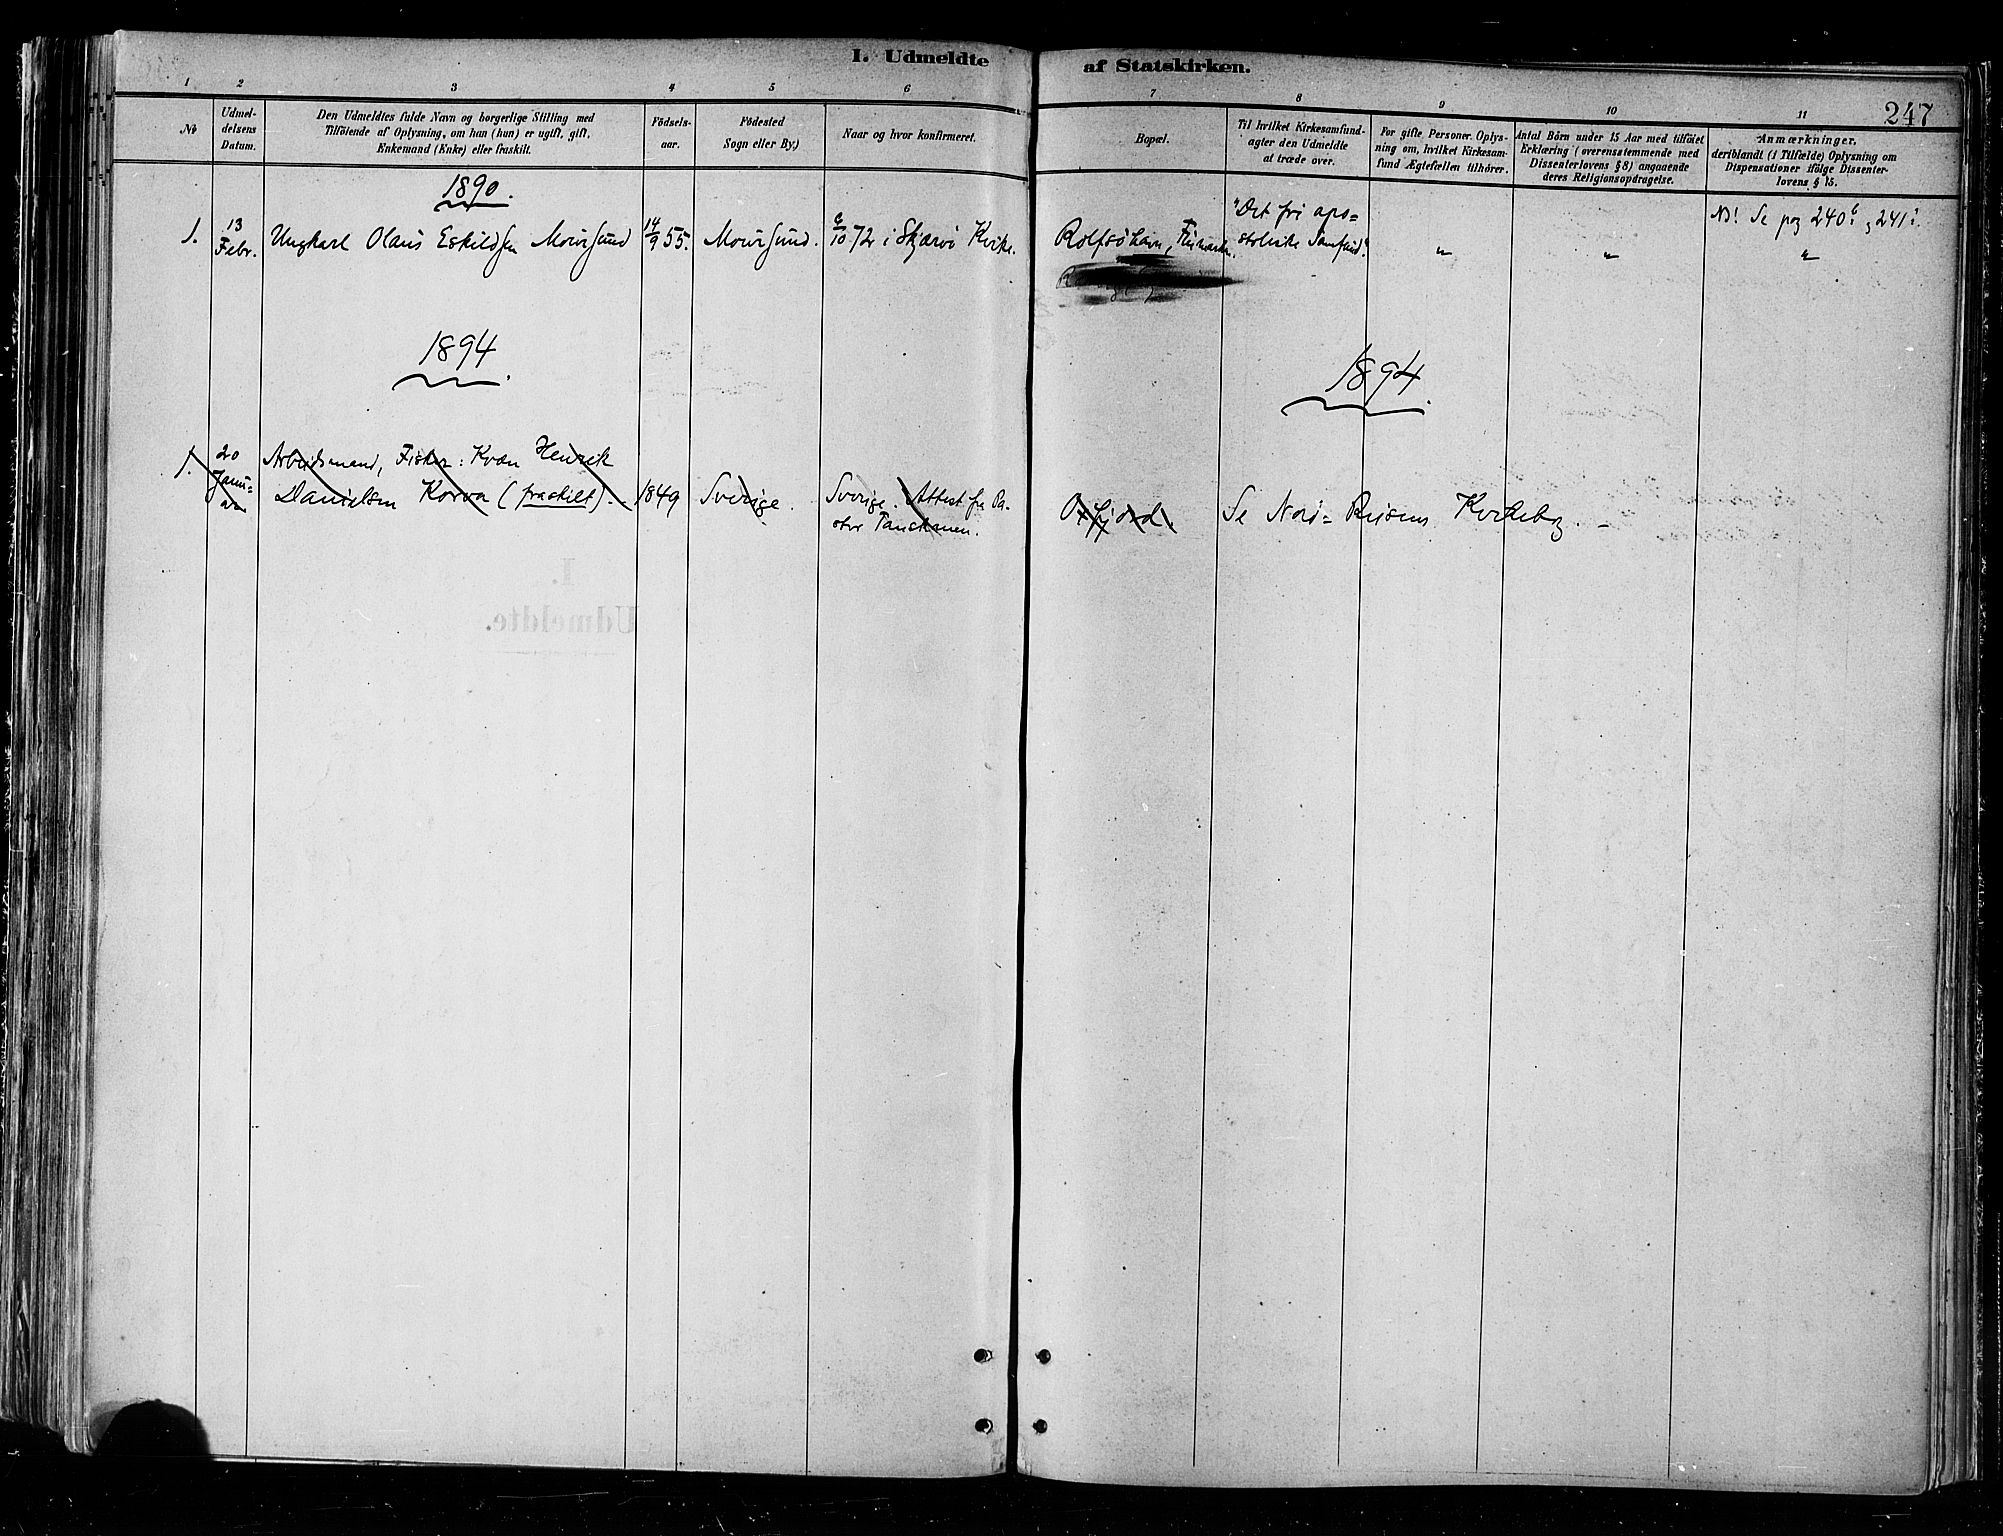 SATØ, Skjervøy sokneprestkontor, H/Ha/Haa/L0010kirke: Ministerialbok nr. 10, 1887-1898, s. 247